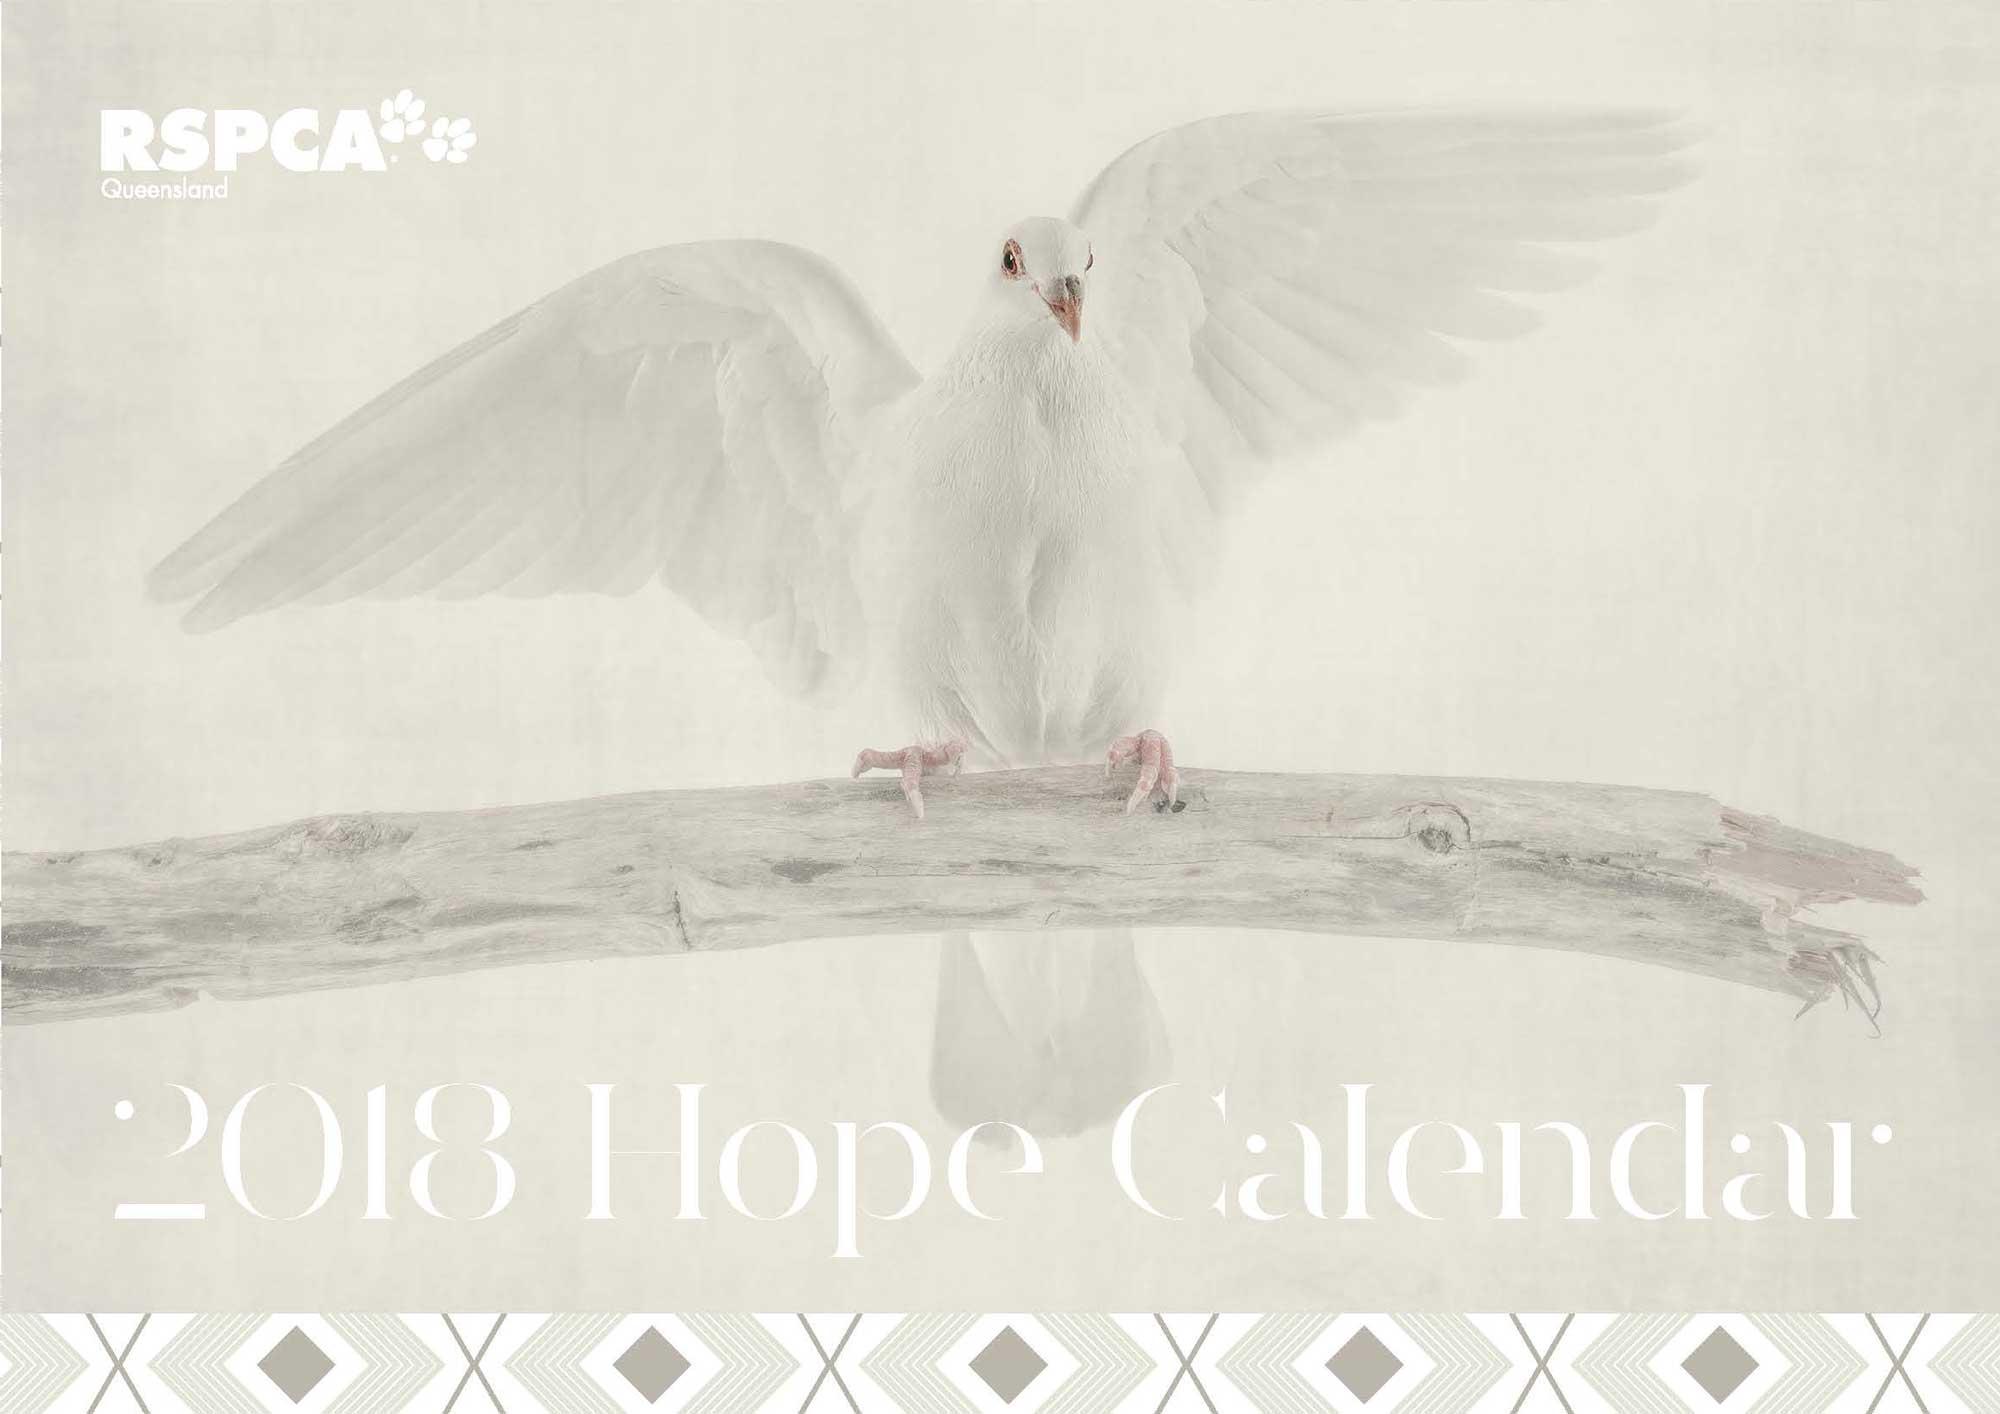 rspca-hopecalendar-2018-cover-title-image